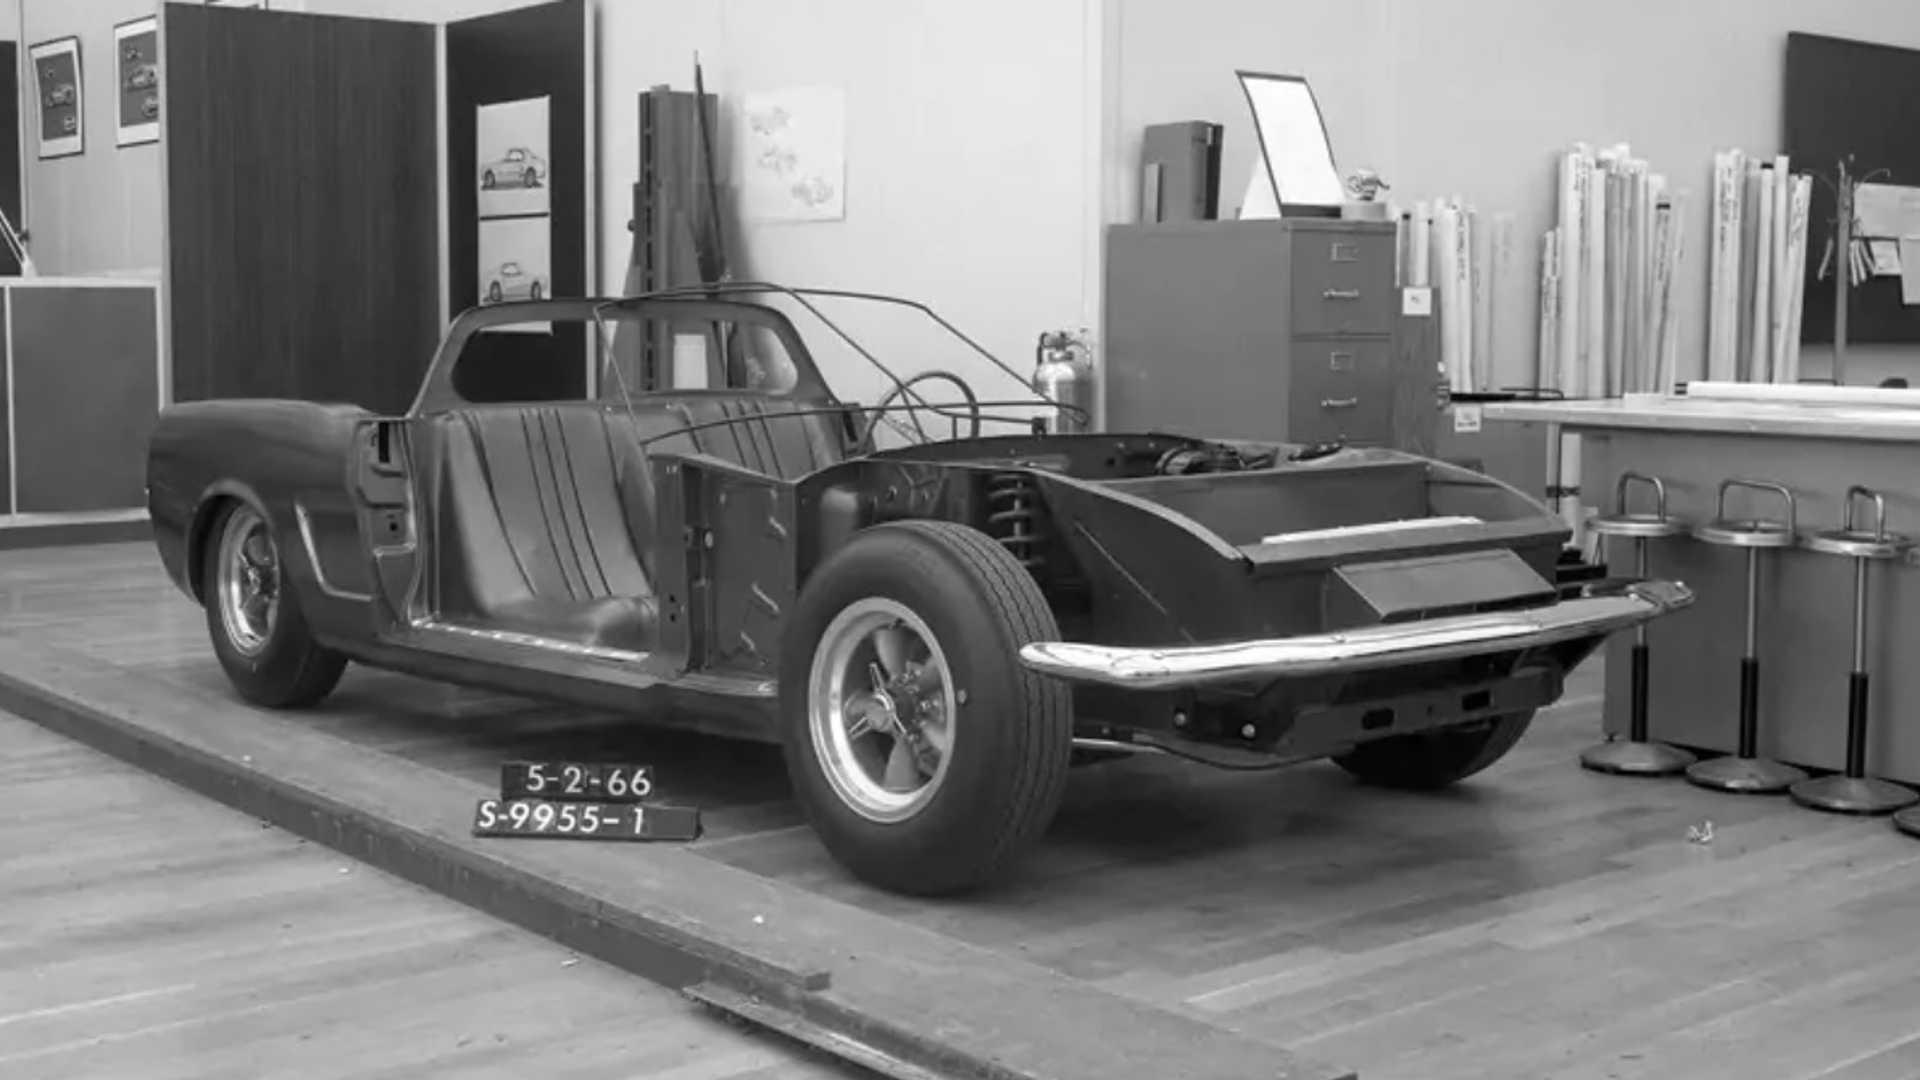 Ford Mustang de motor central de 1966